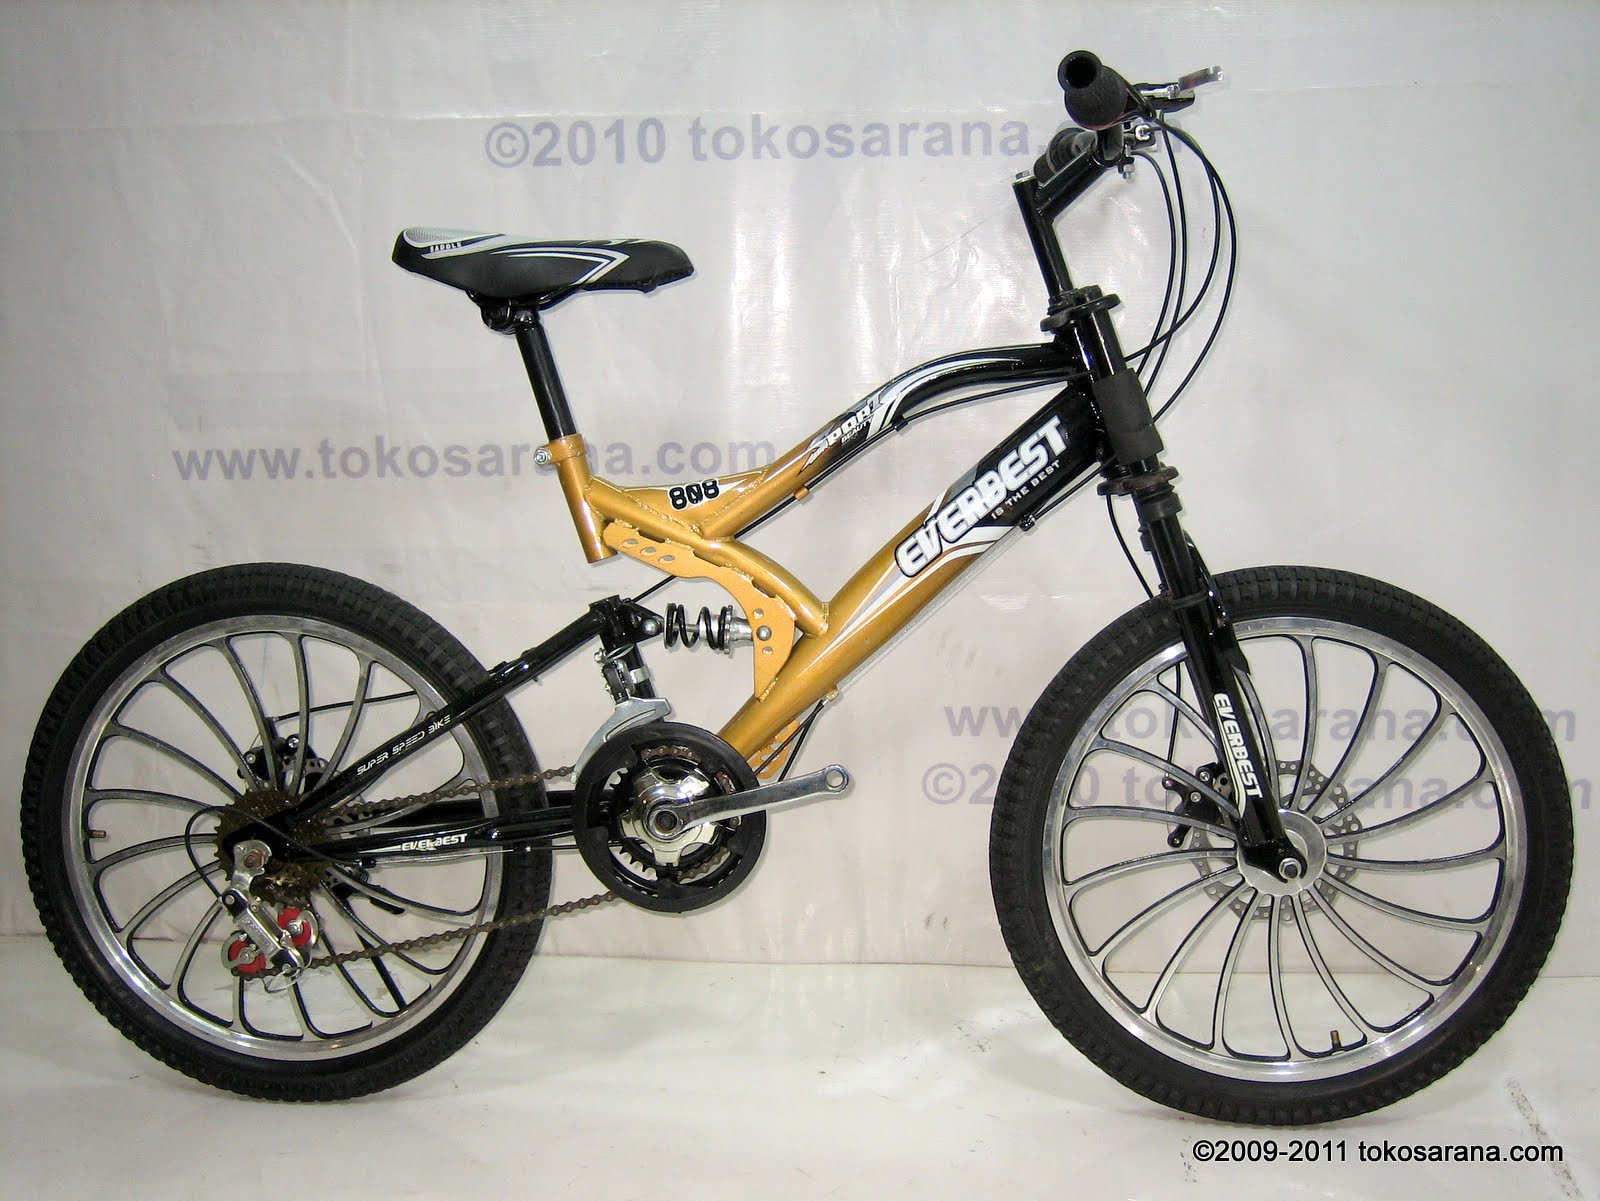 Sepeda Gunung Everbest 20808 RC Racing 20 Inci News